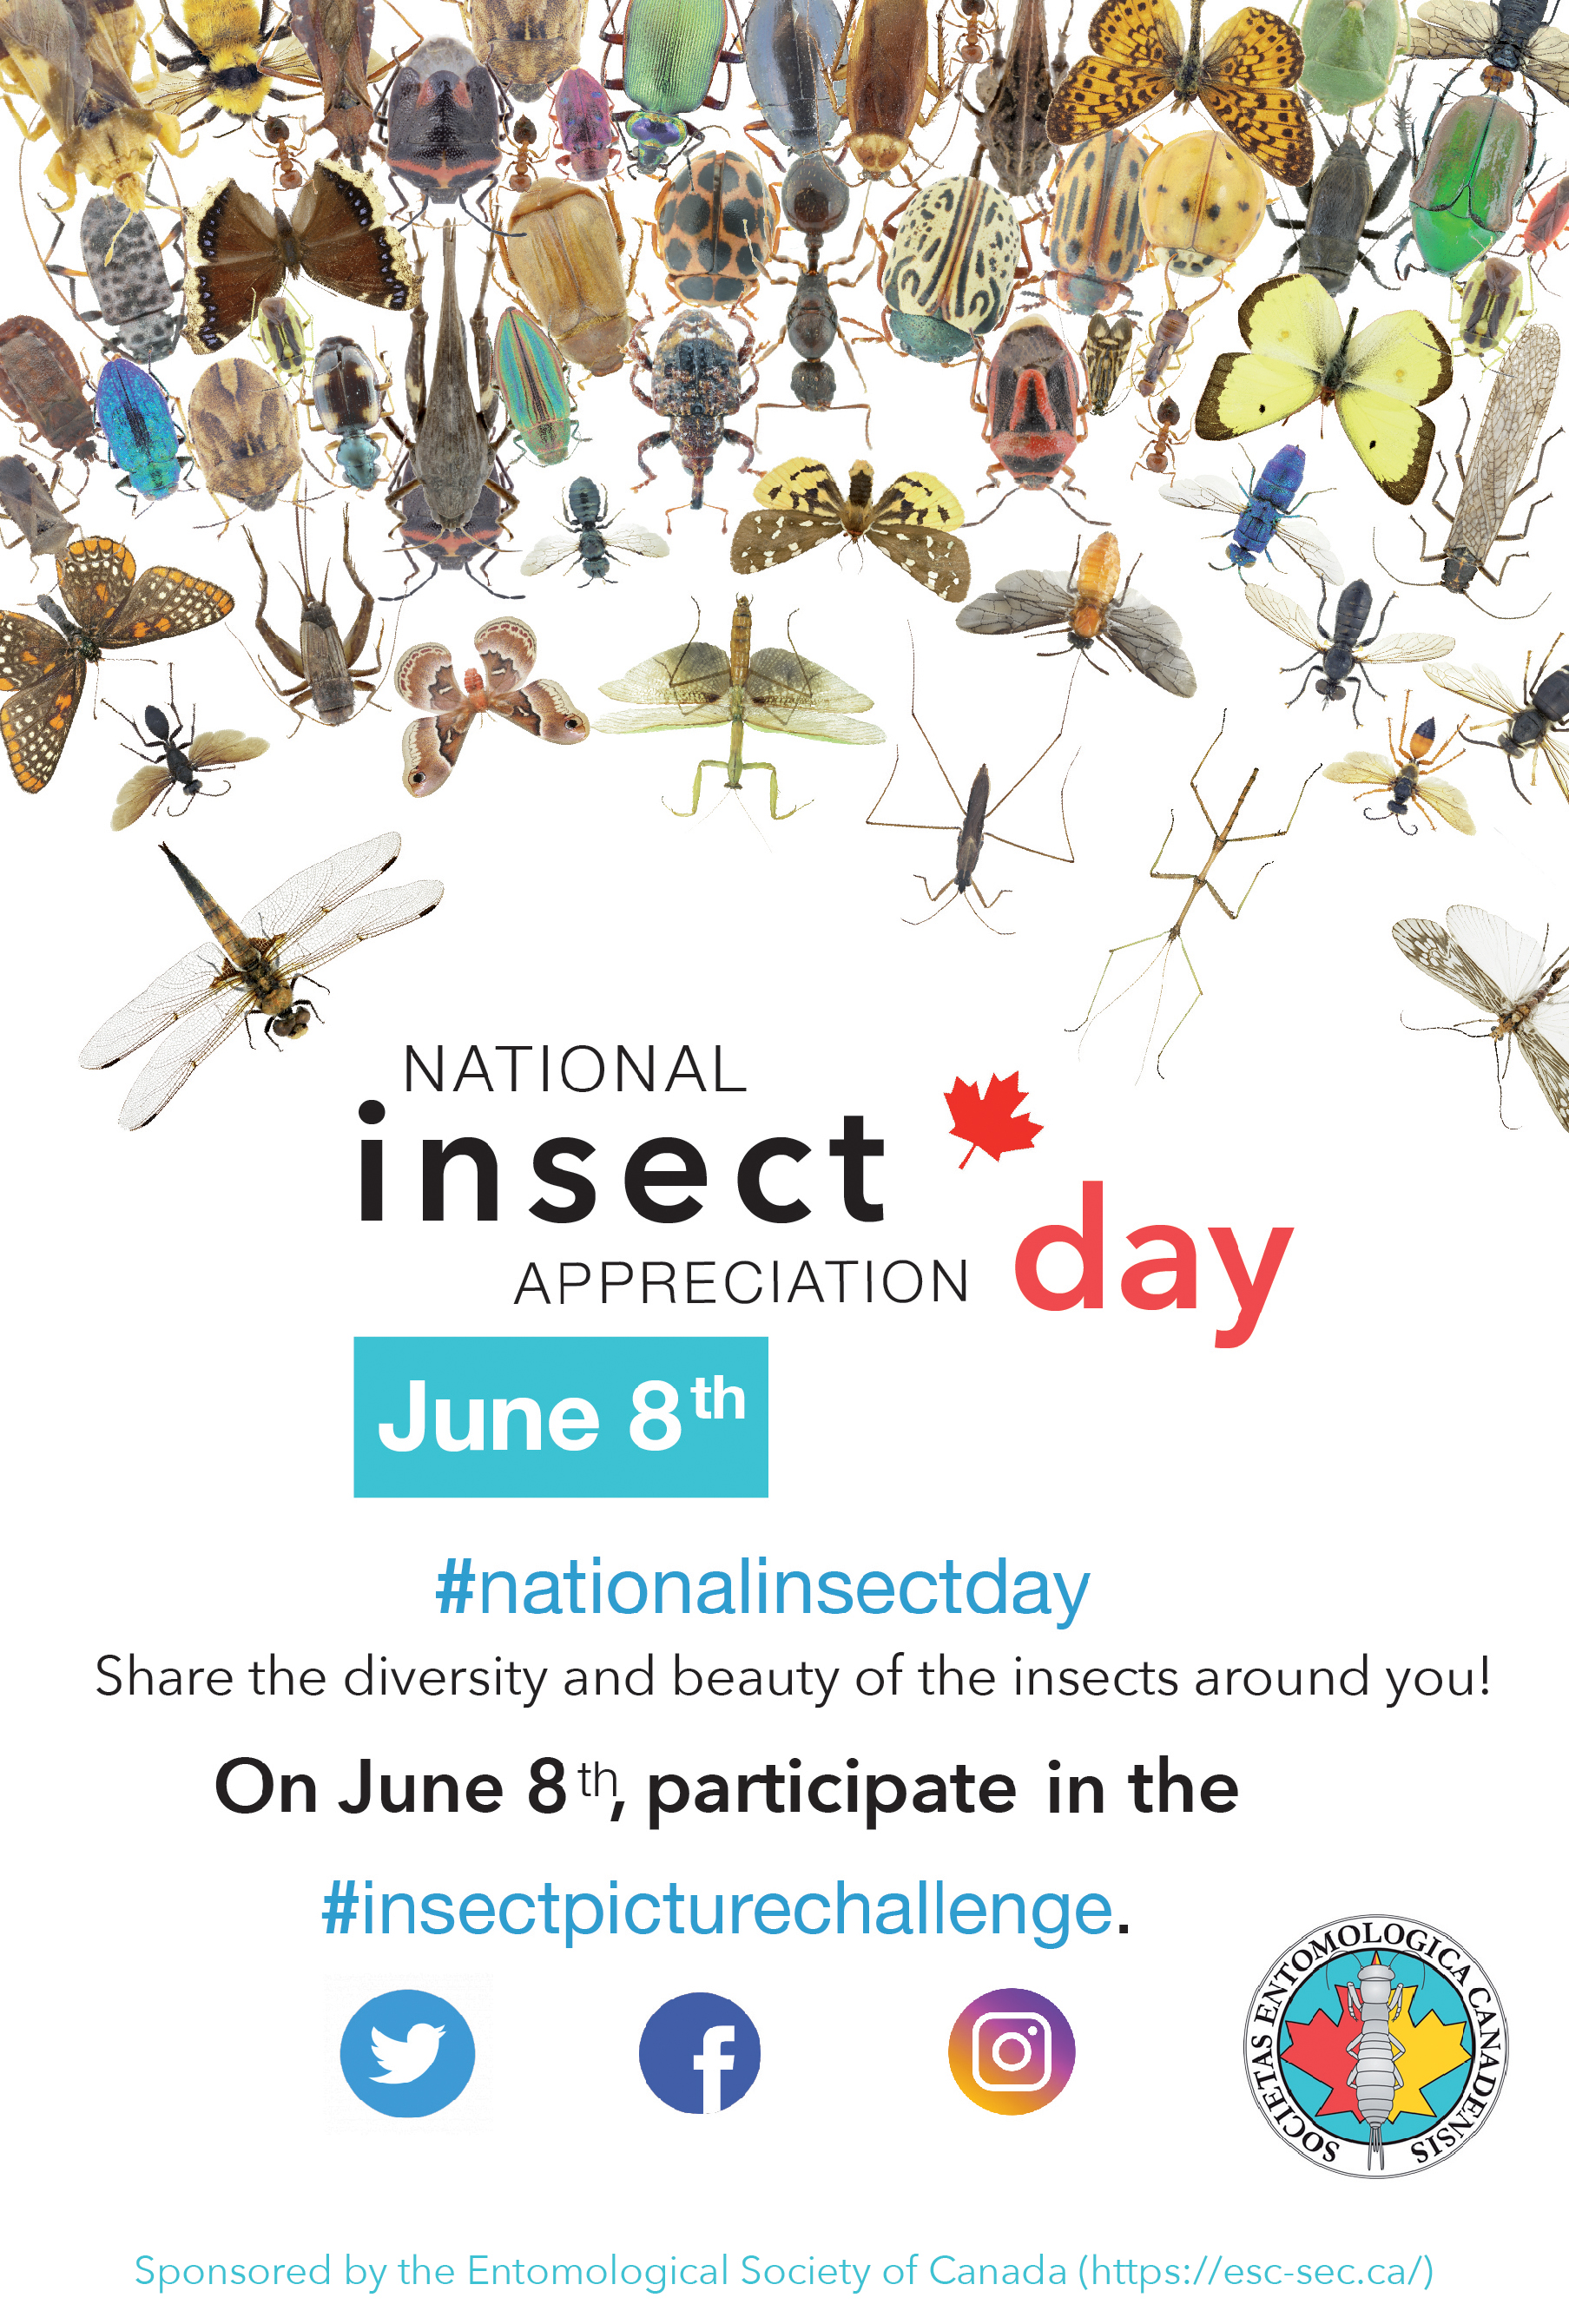 Education and Outreach – Entomological Society of Canada